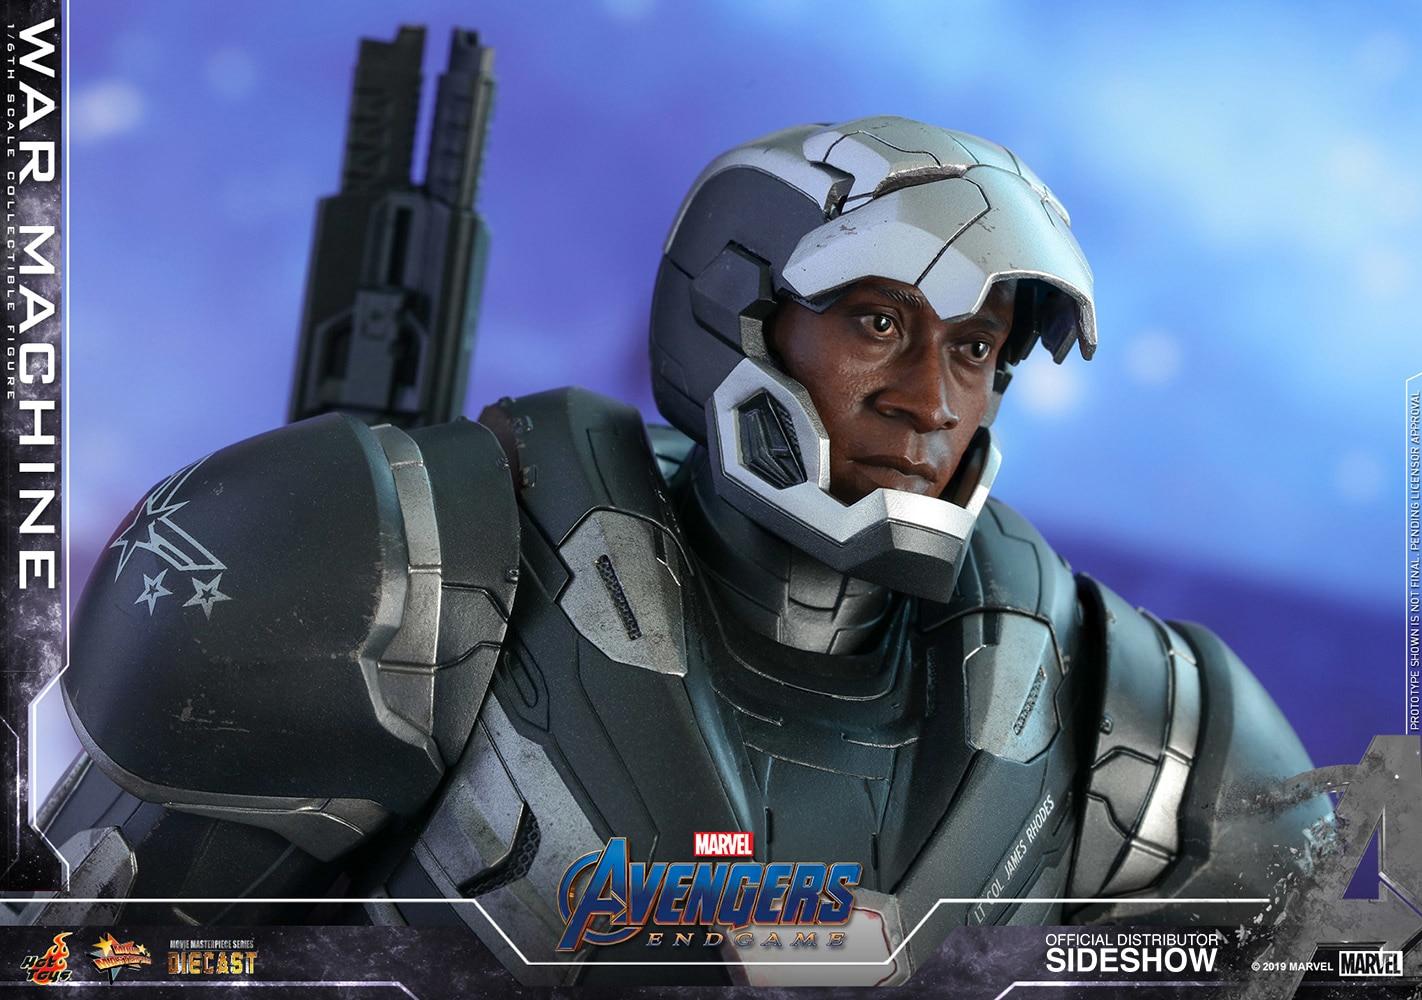 Hot Toys presenta su figura de Avengers: Endgame War Machine Movie Masterpiece Series